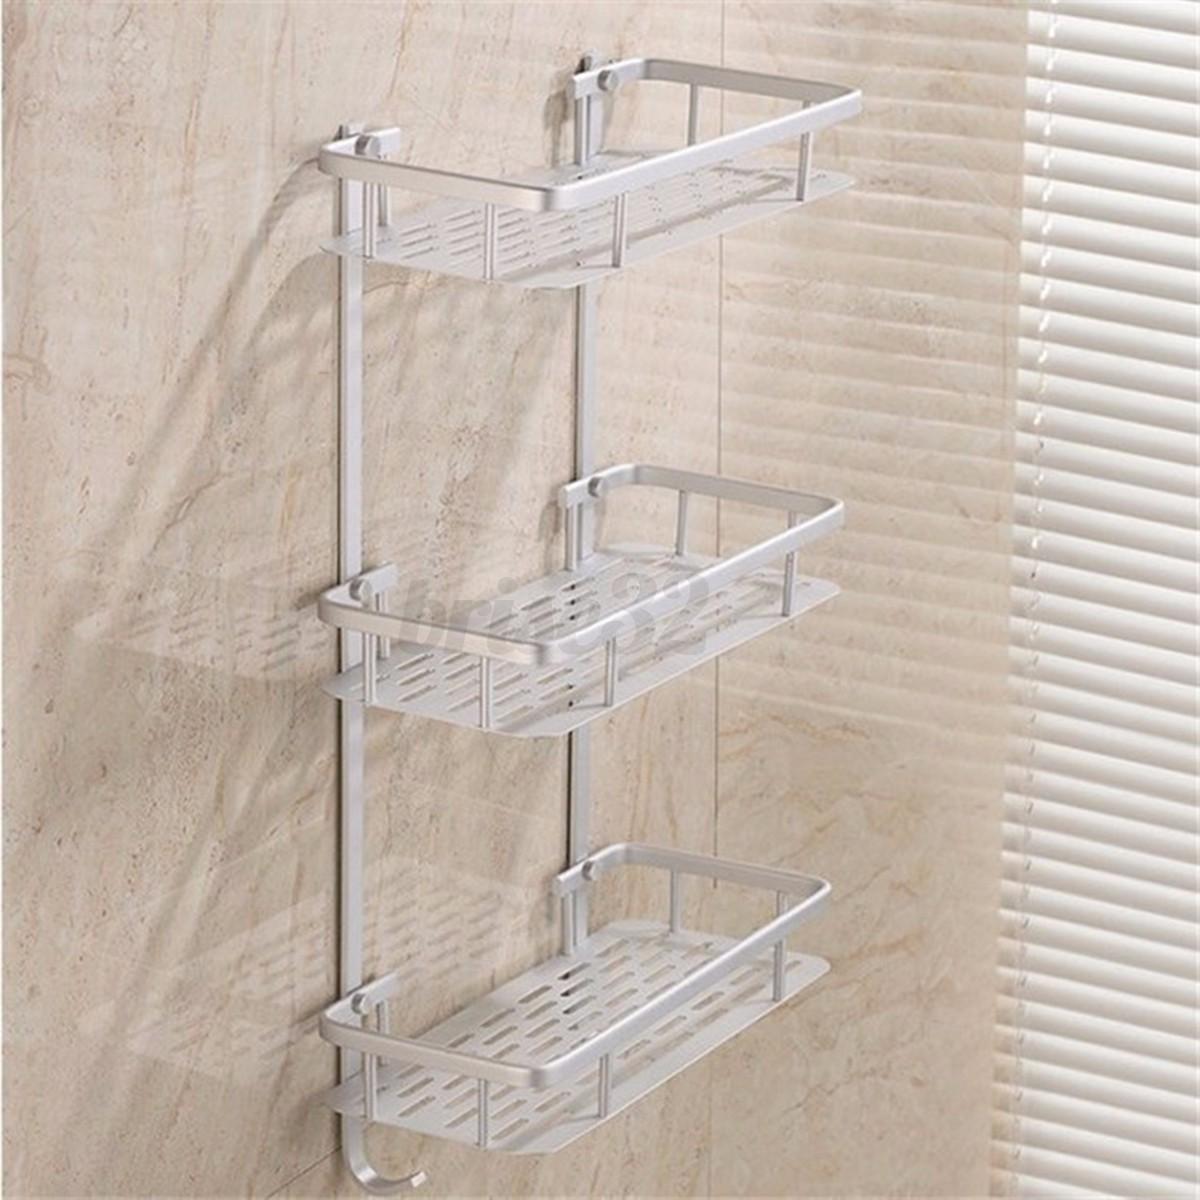 Soporte de almacenamiento de jab n champ de ducha de for Accesorios de almacenamiento de bano